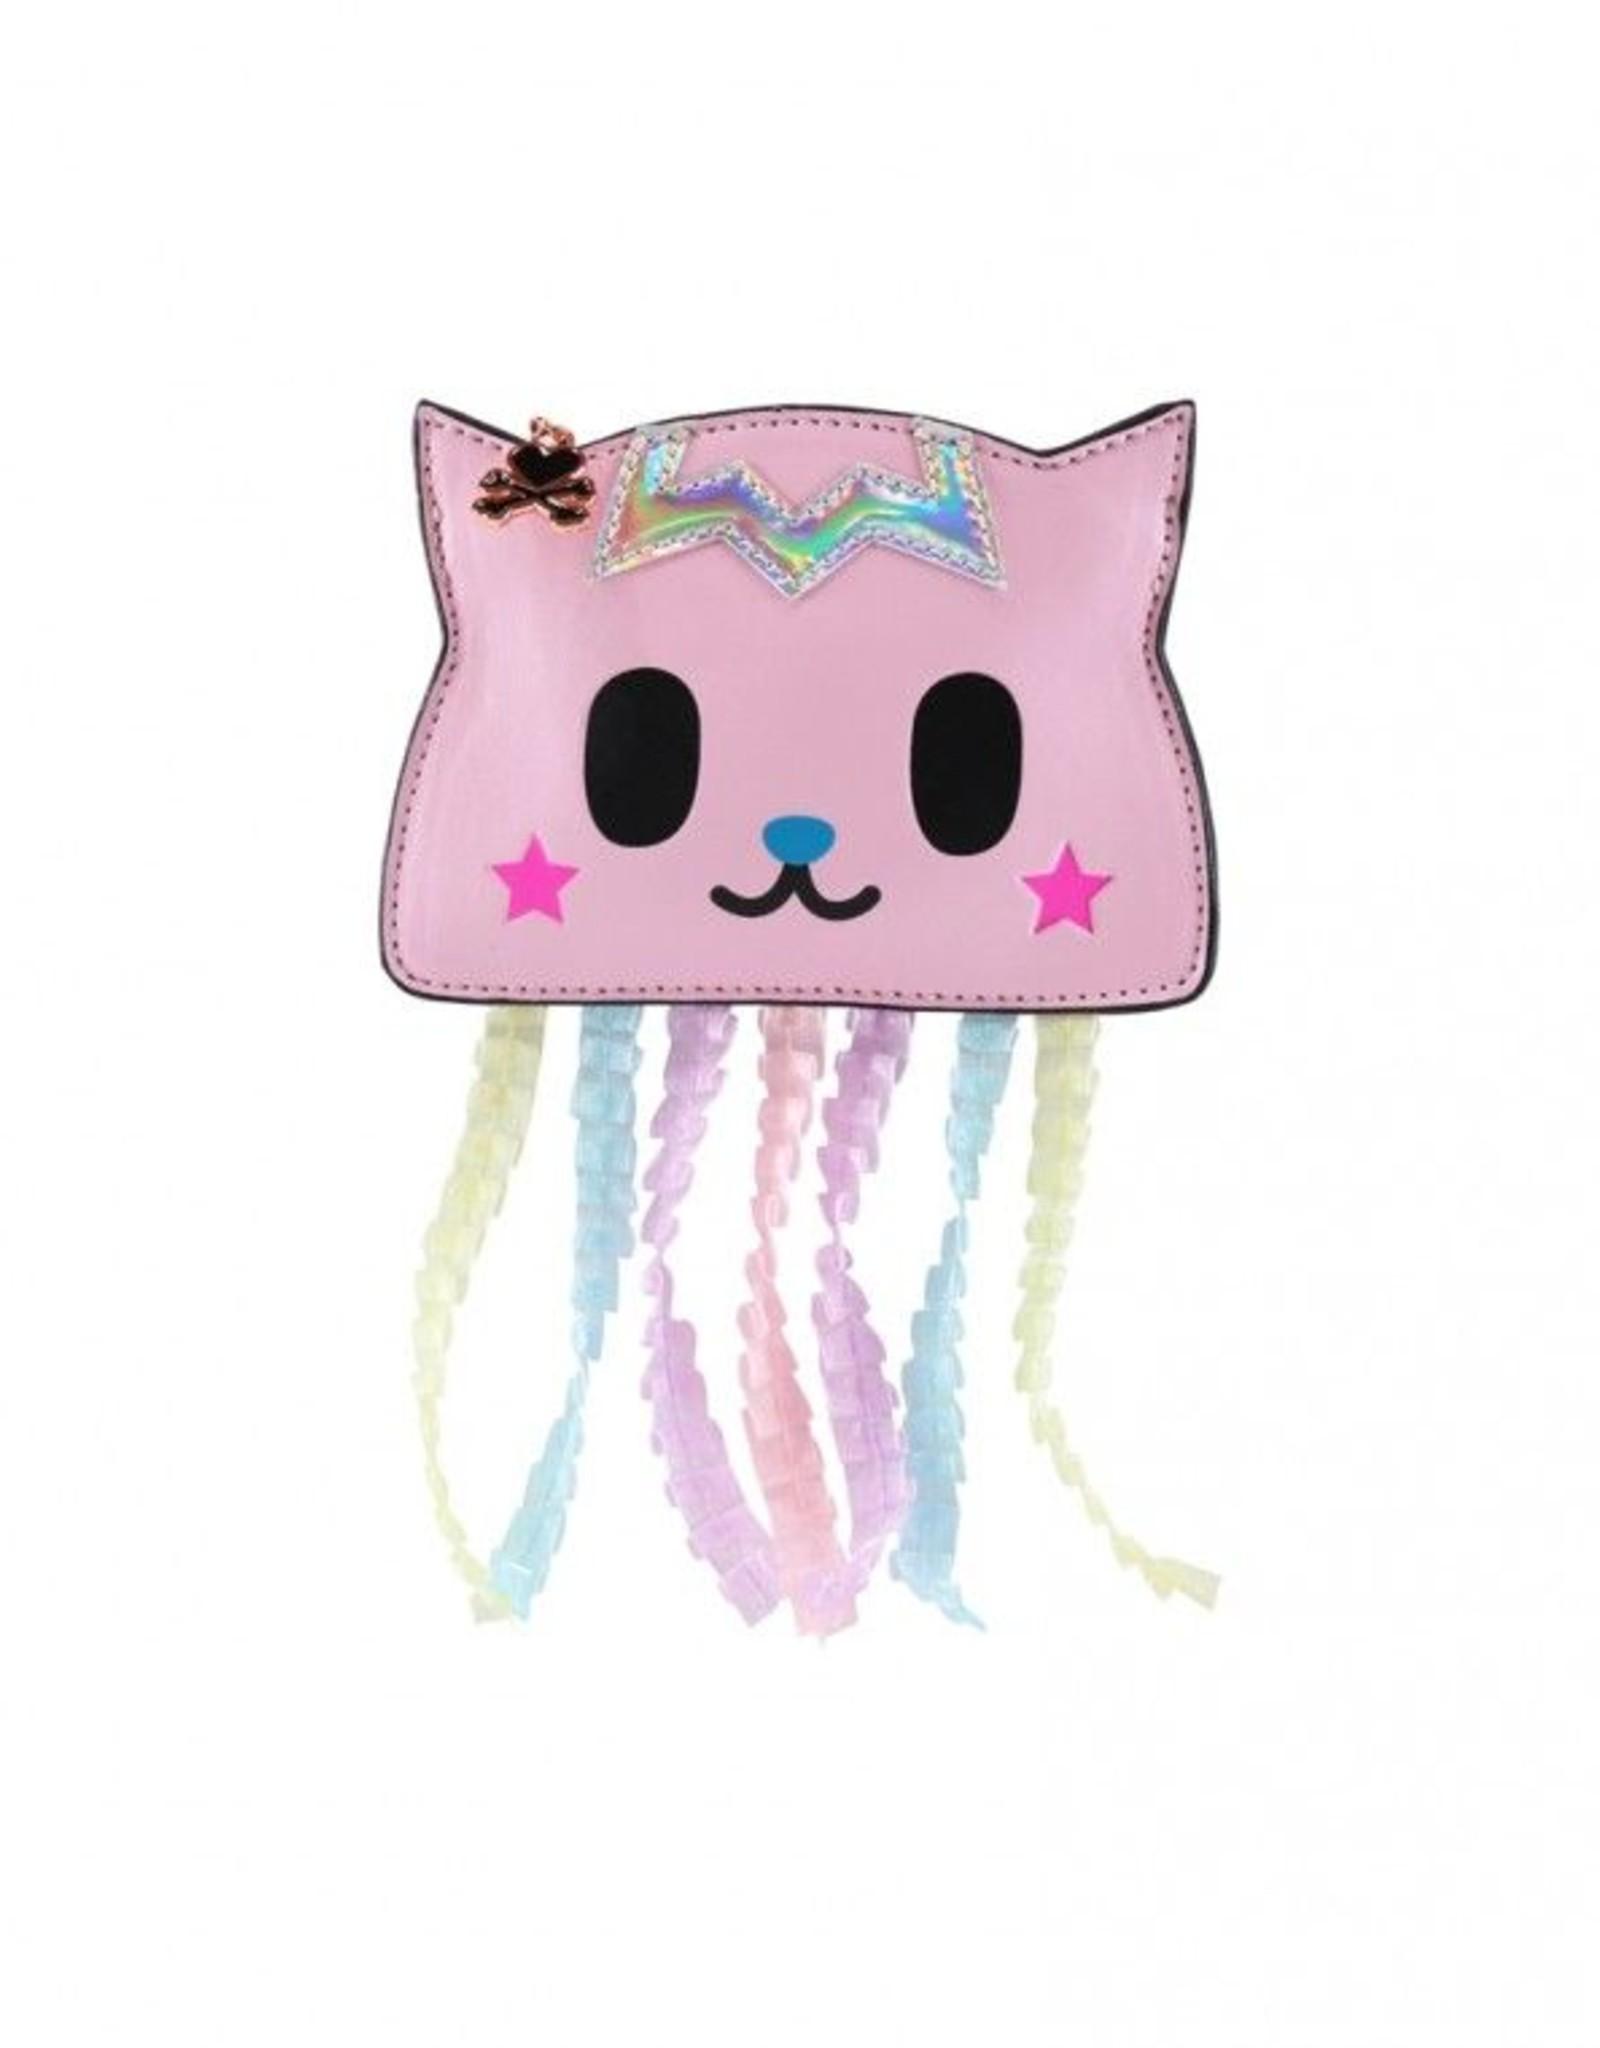 tokidoki - California Dreamin' Jellycat Coin Purse